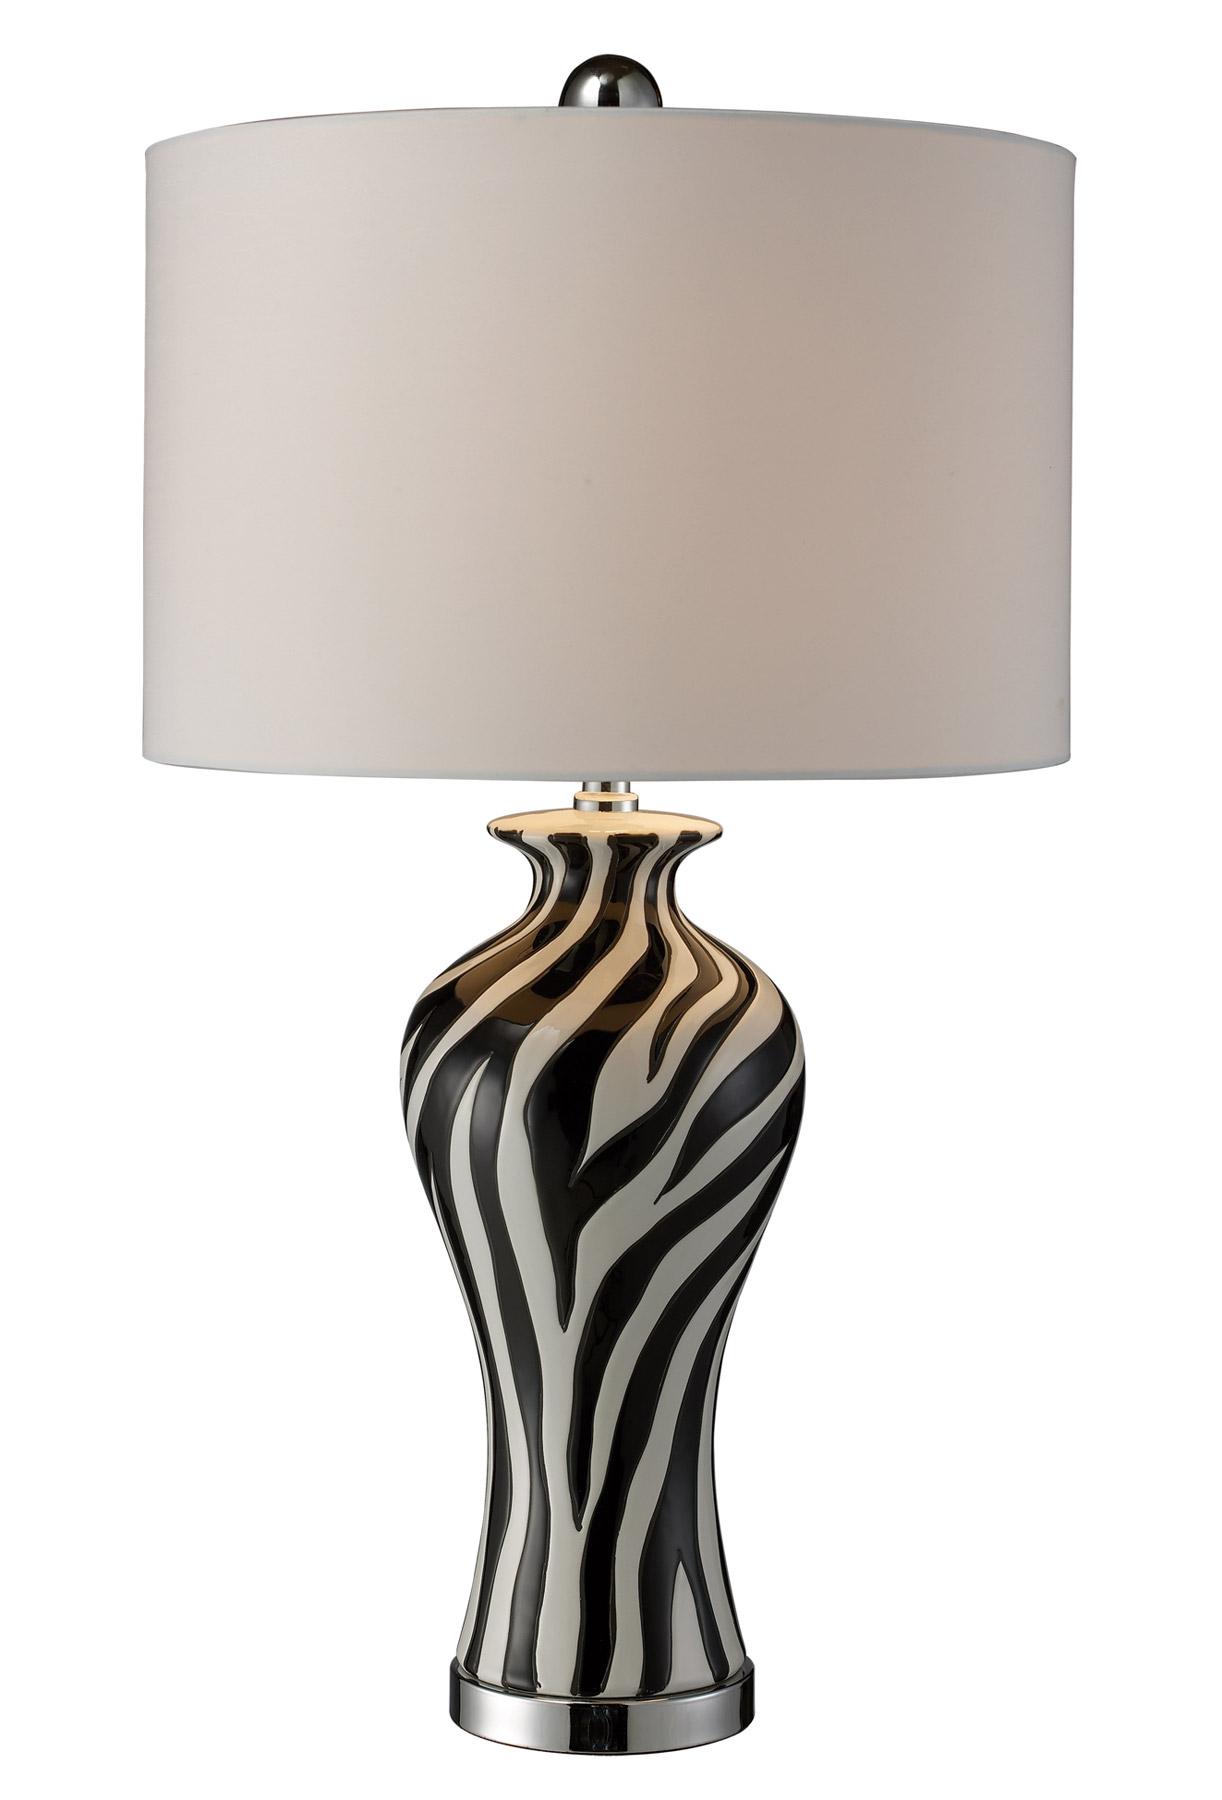 home lamps table lamps standard table lamps dimond d1882. Black Bedroom Furniture Sets. Home Design Ideas